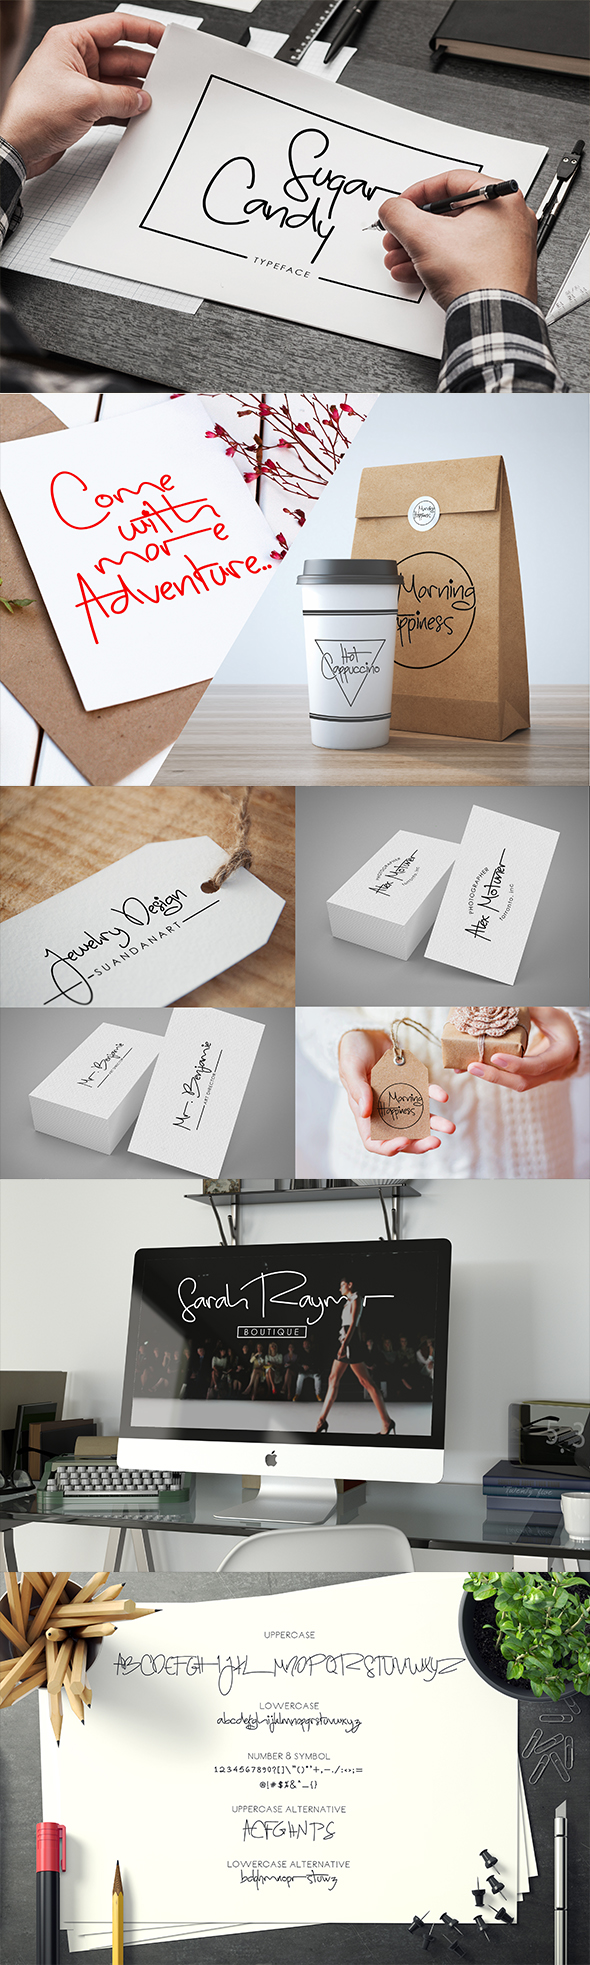 Sugar Candy Signature Typeface - Calligraphy Script